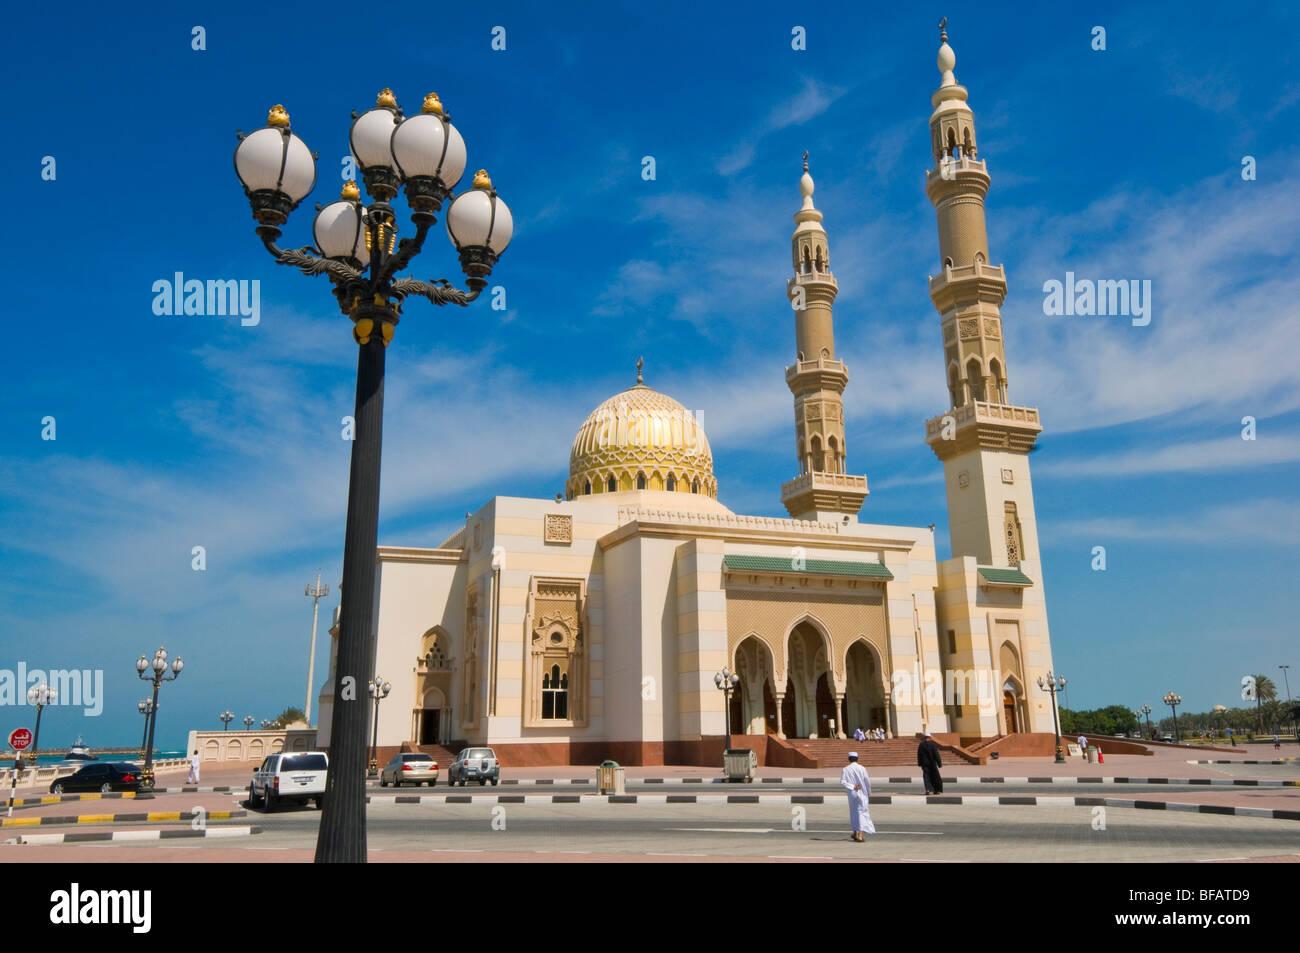 Sharjah Mosque United Arab Emirates - Stock Image